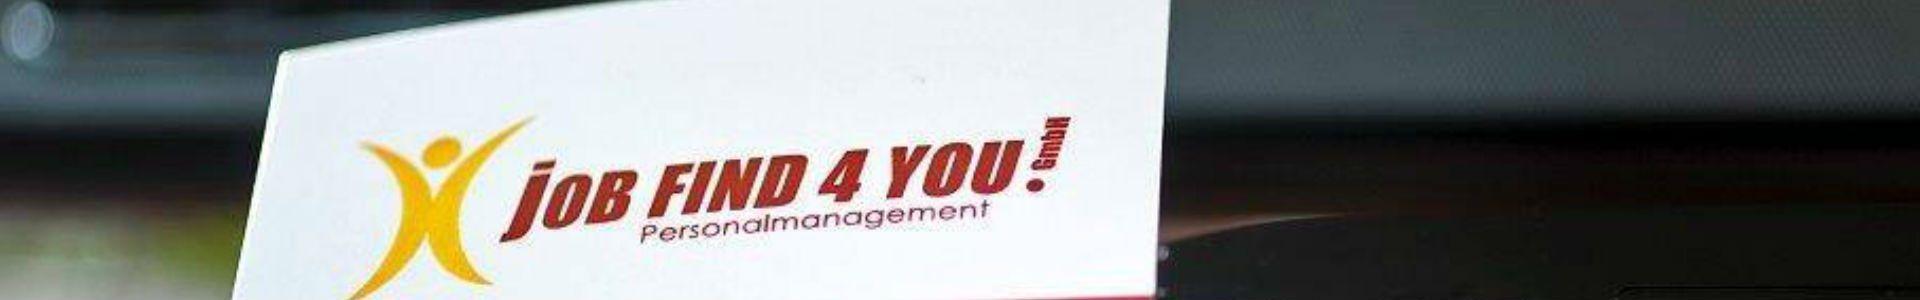 job-find-4-you-team-nijhuis-header